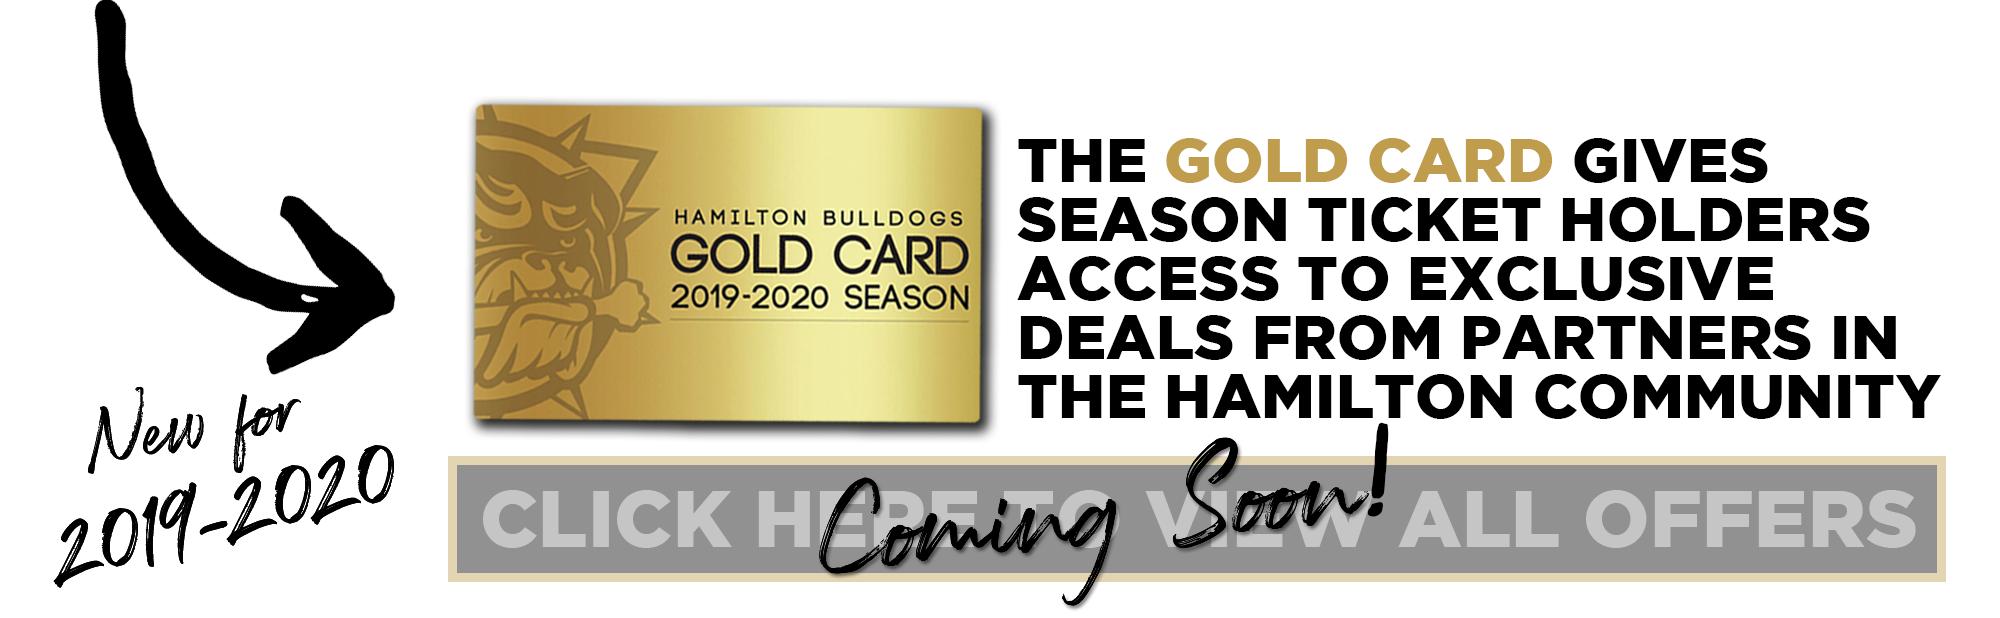 Season-GoldCard(soon)